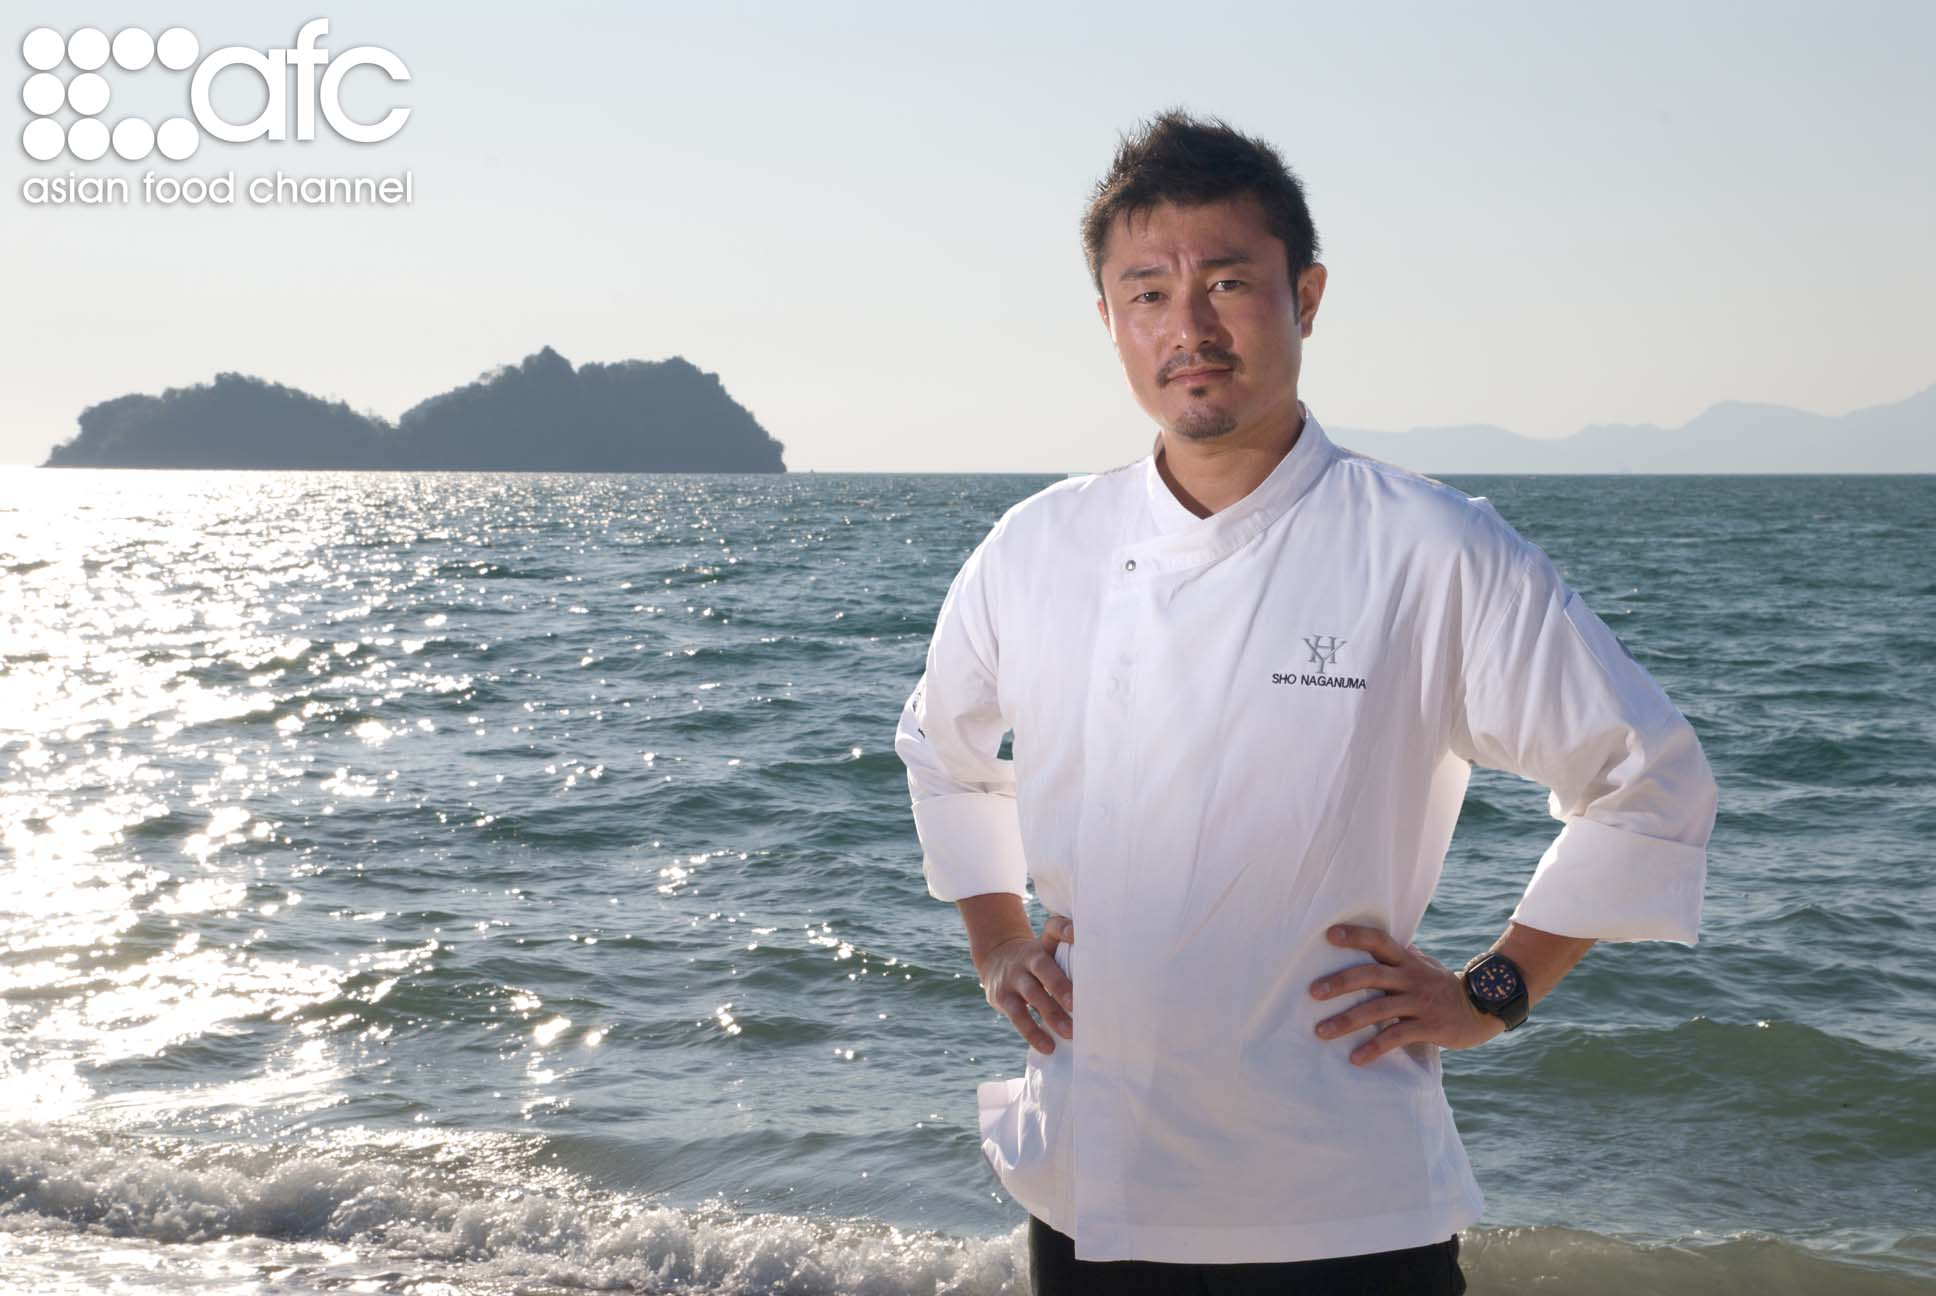 One Night in Langkawi – Sho Naganuma by Asian Food Channel